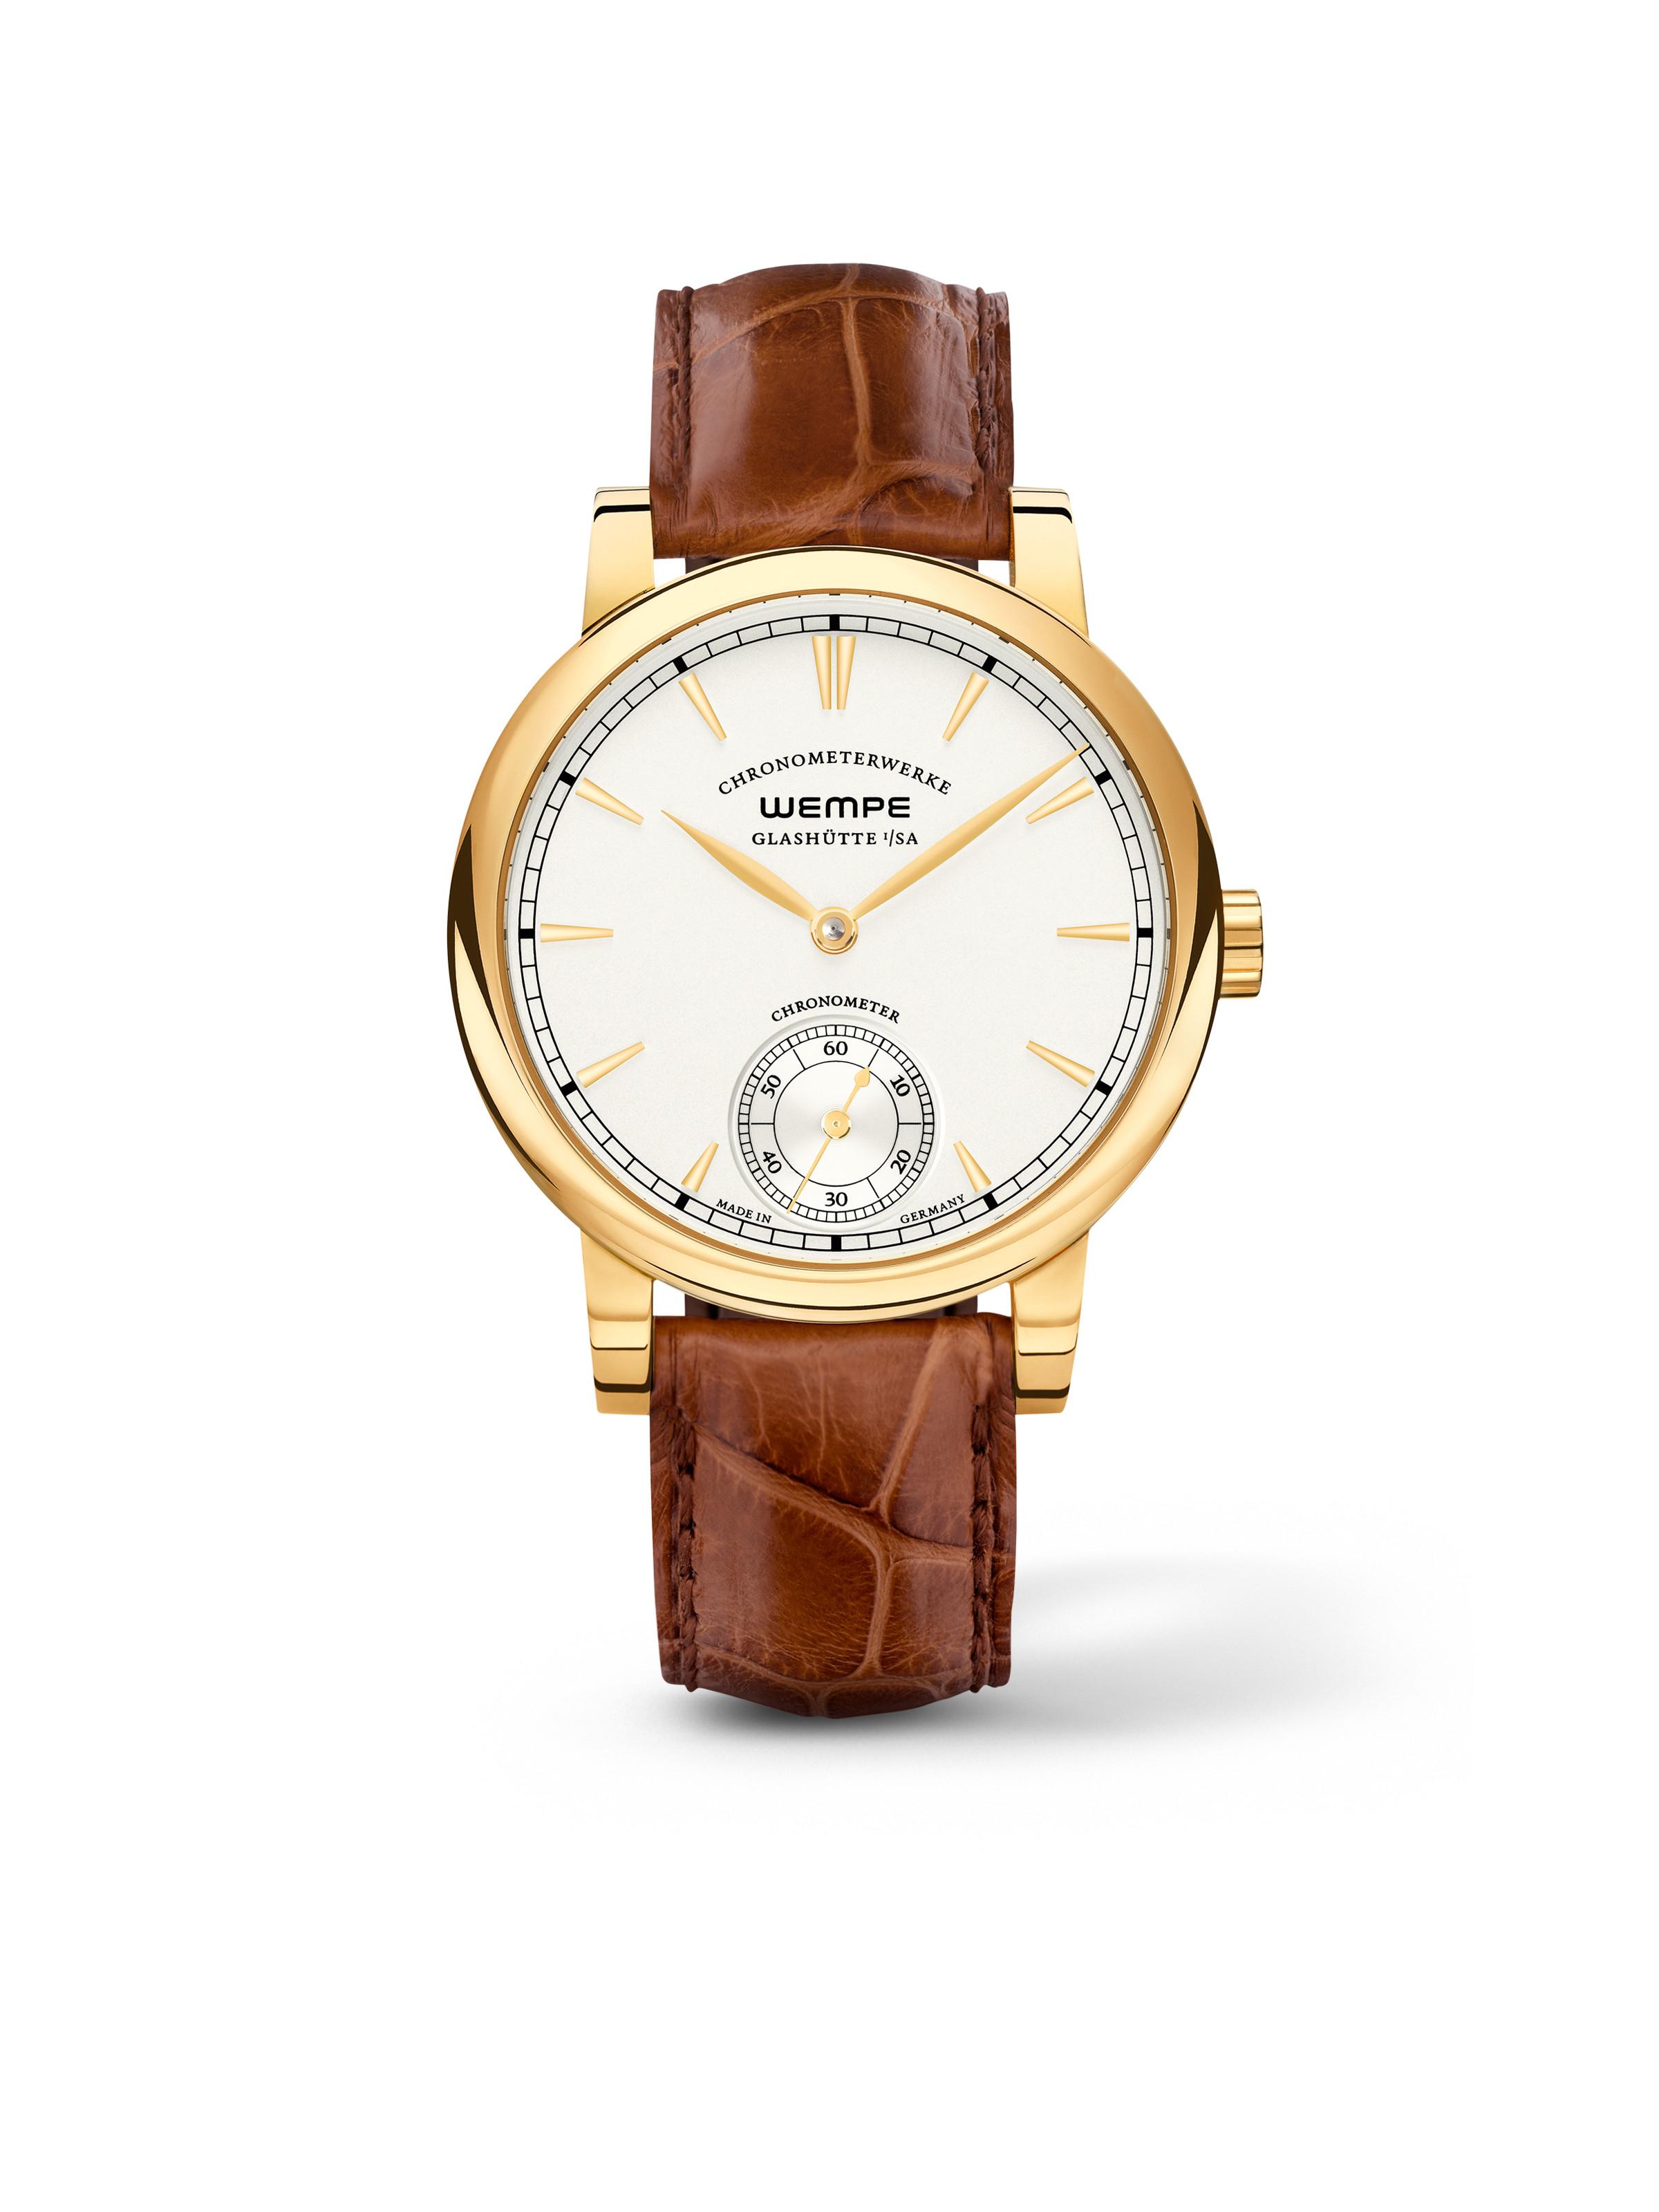 Chronometerwerke Petite Seconde